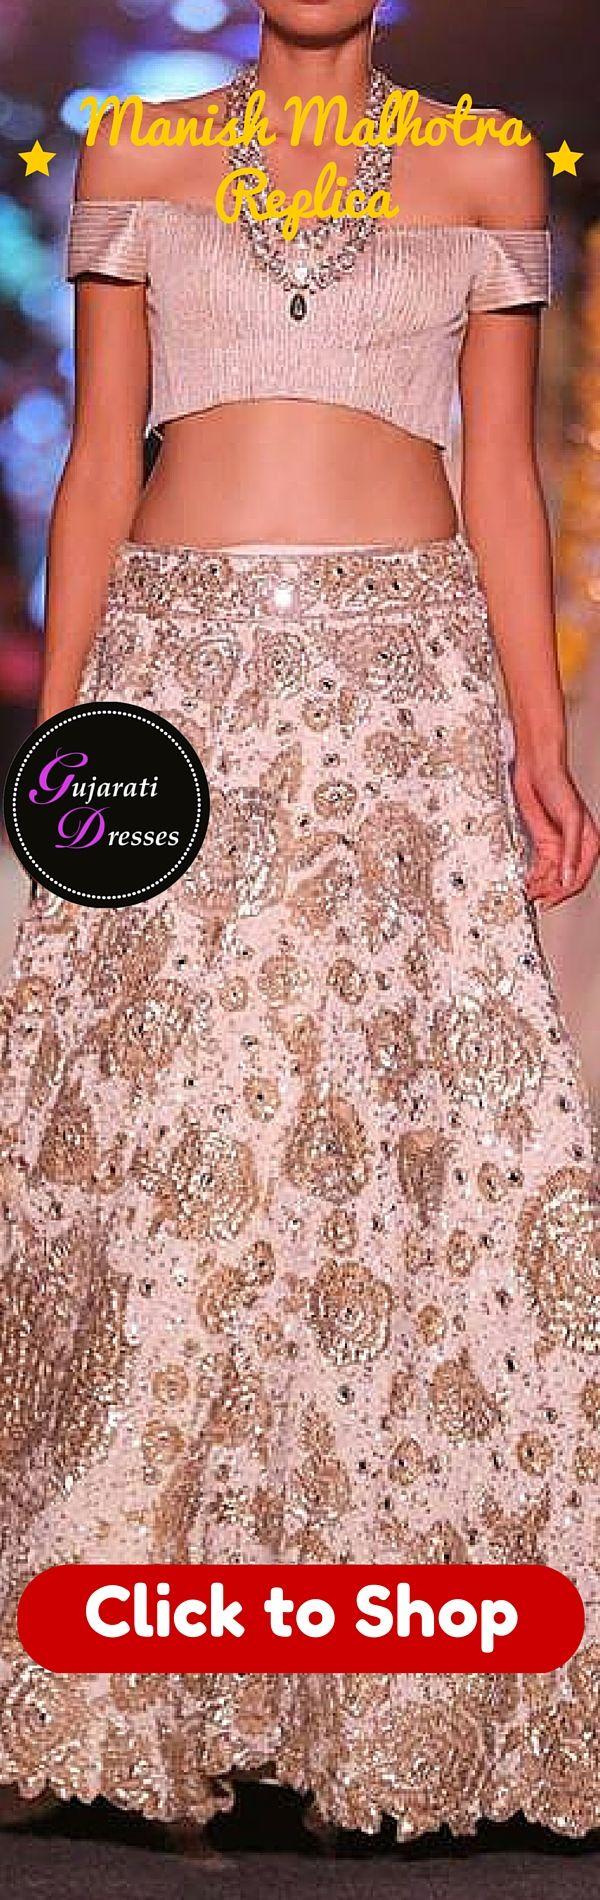 Buy Manish Malhotra replica of this  cream lehenga choli showcased at lakme fashion week 2015 here: http://www.gujaratidresses.com/manish-malhotra-lehenga-choli-2015/ at 2500$ USD #lehenga #lehengacholi #bridal #bridaldress #indianbride #indianbridal #indianfashion #indiandesigner #designerwear #indianwear #indianclothing #indianoutfit #manishmalhotra #lakmefashionweek #lfw #lengha #sari #saree #bridetobe #indianwedding #weddingdress